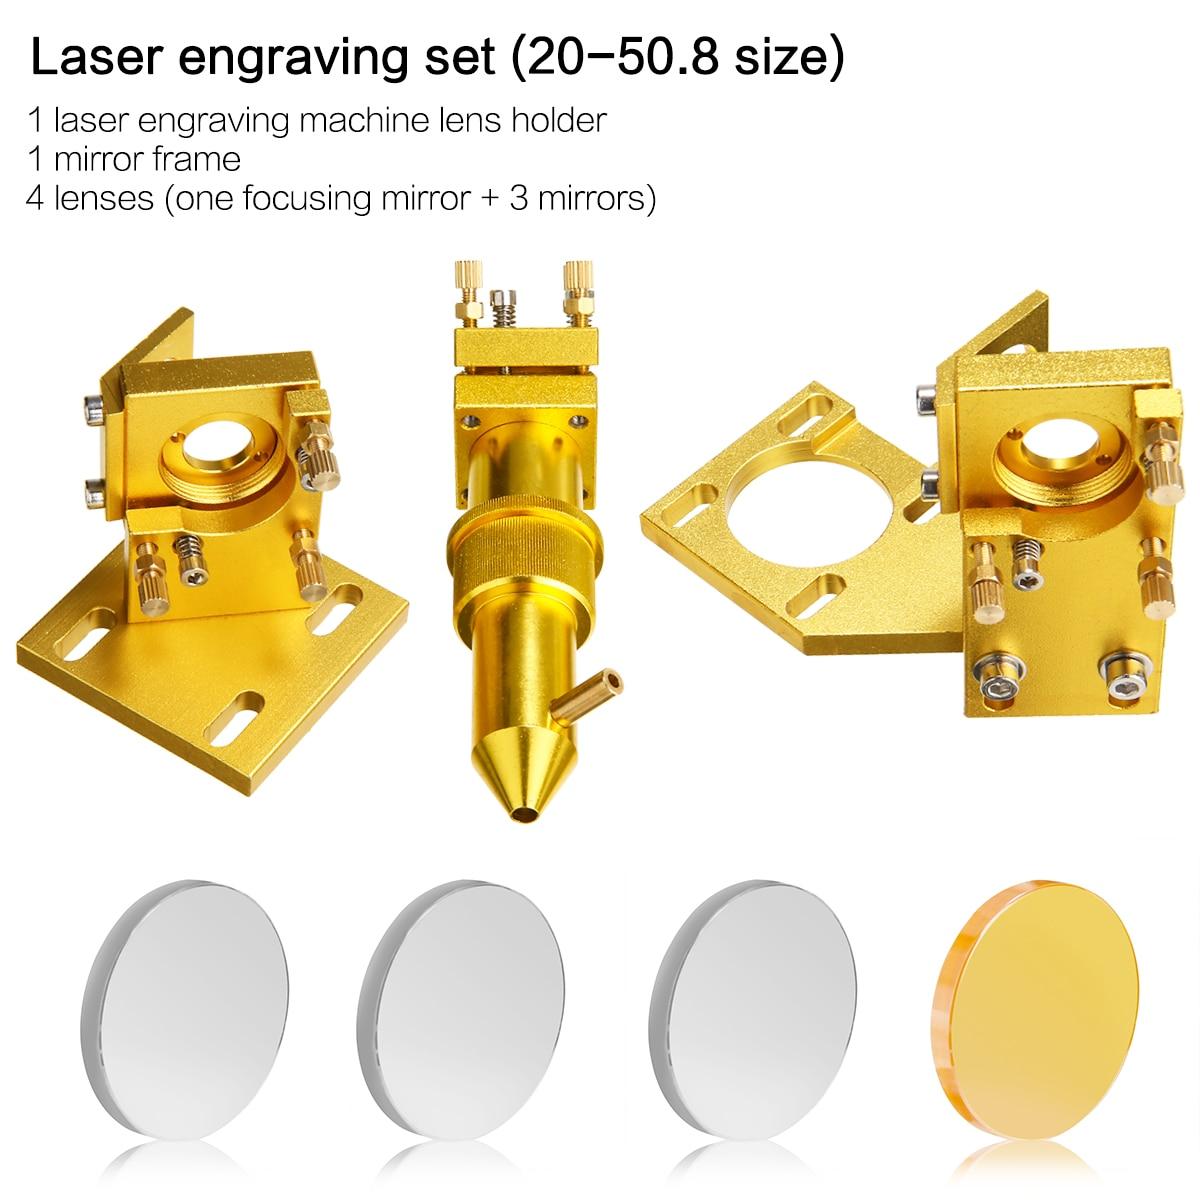 CO2 Laser Head Set Mirror Mount  Lens & Mirror for K40 2030 Engraver Cutter Laser Engraving Cutting MachineCO2 Laser Head Set Mirror Mount  Lens & Mirror for K40 2030 Engraver Cutter Laser Engraving Cutting Machine